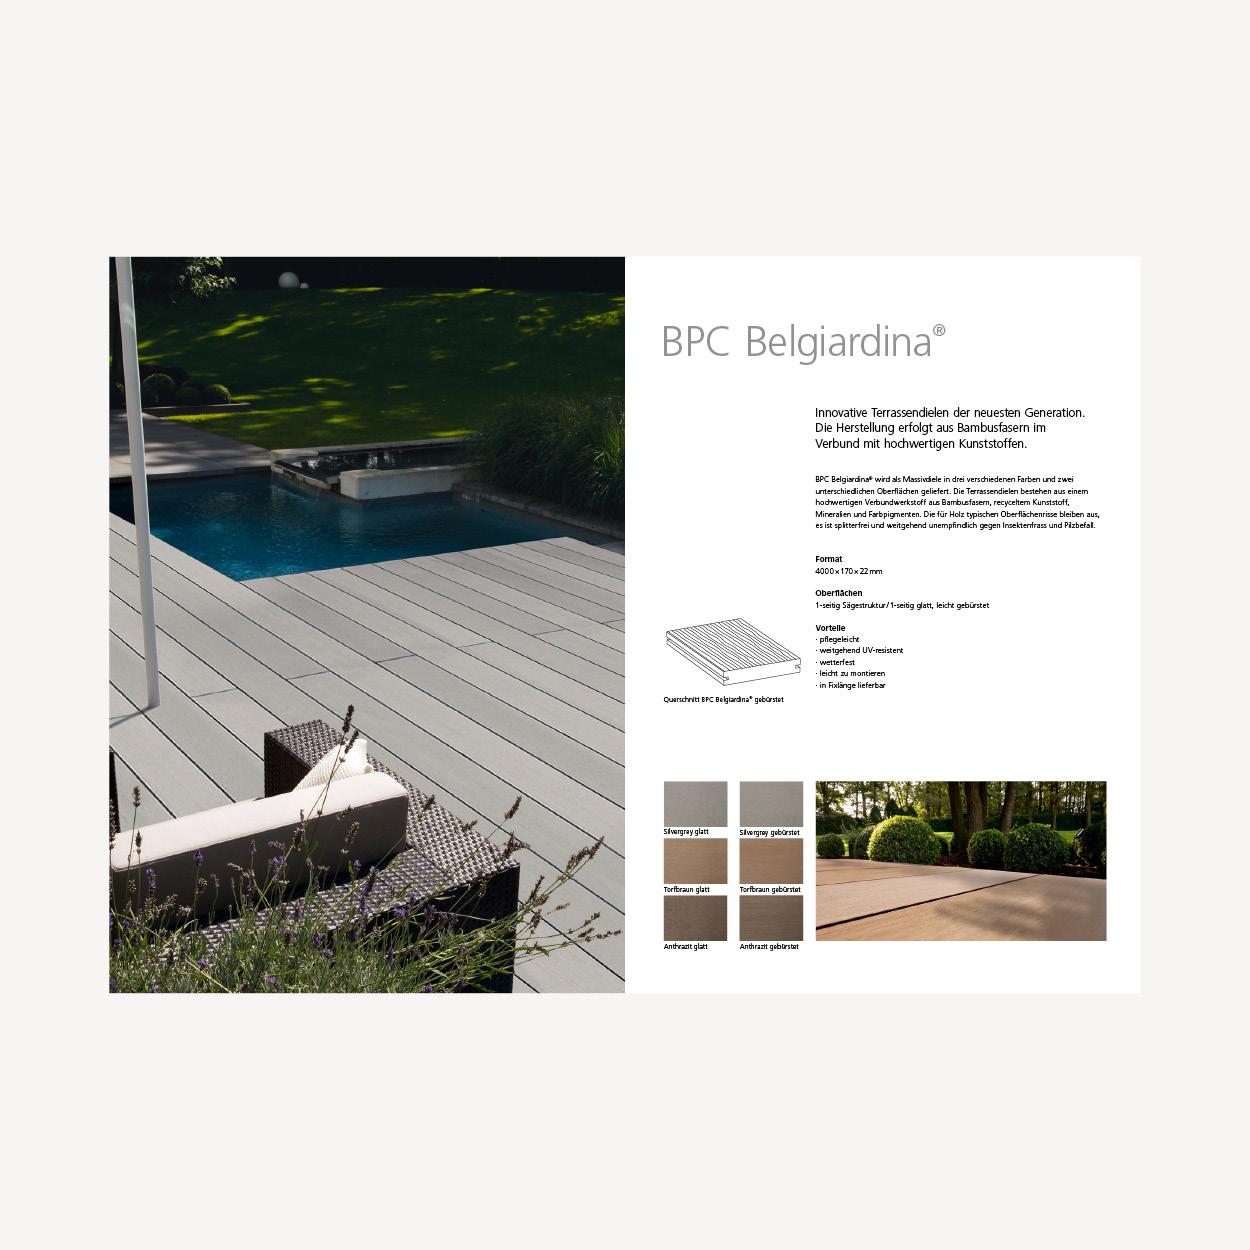 Belcolor Belgiardina – Neulancierung Outdoor Broschüre. Konzeption. Gestaltung. Umsetzung. Bildbearbeitung. Illustrationen. Corporate Design.